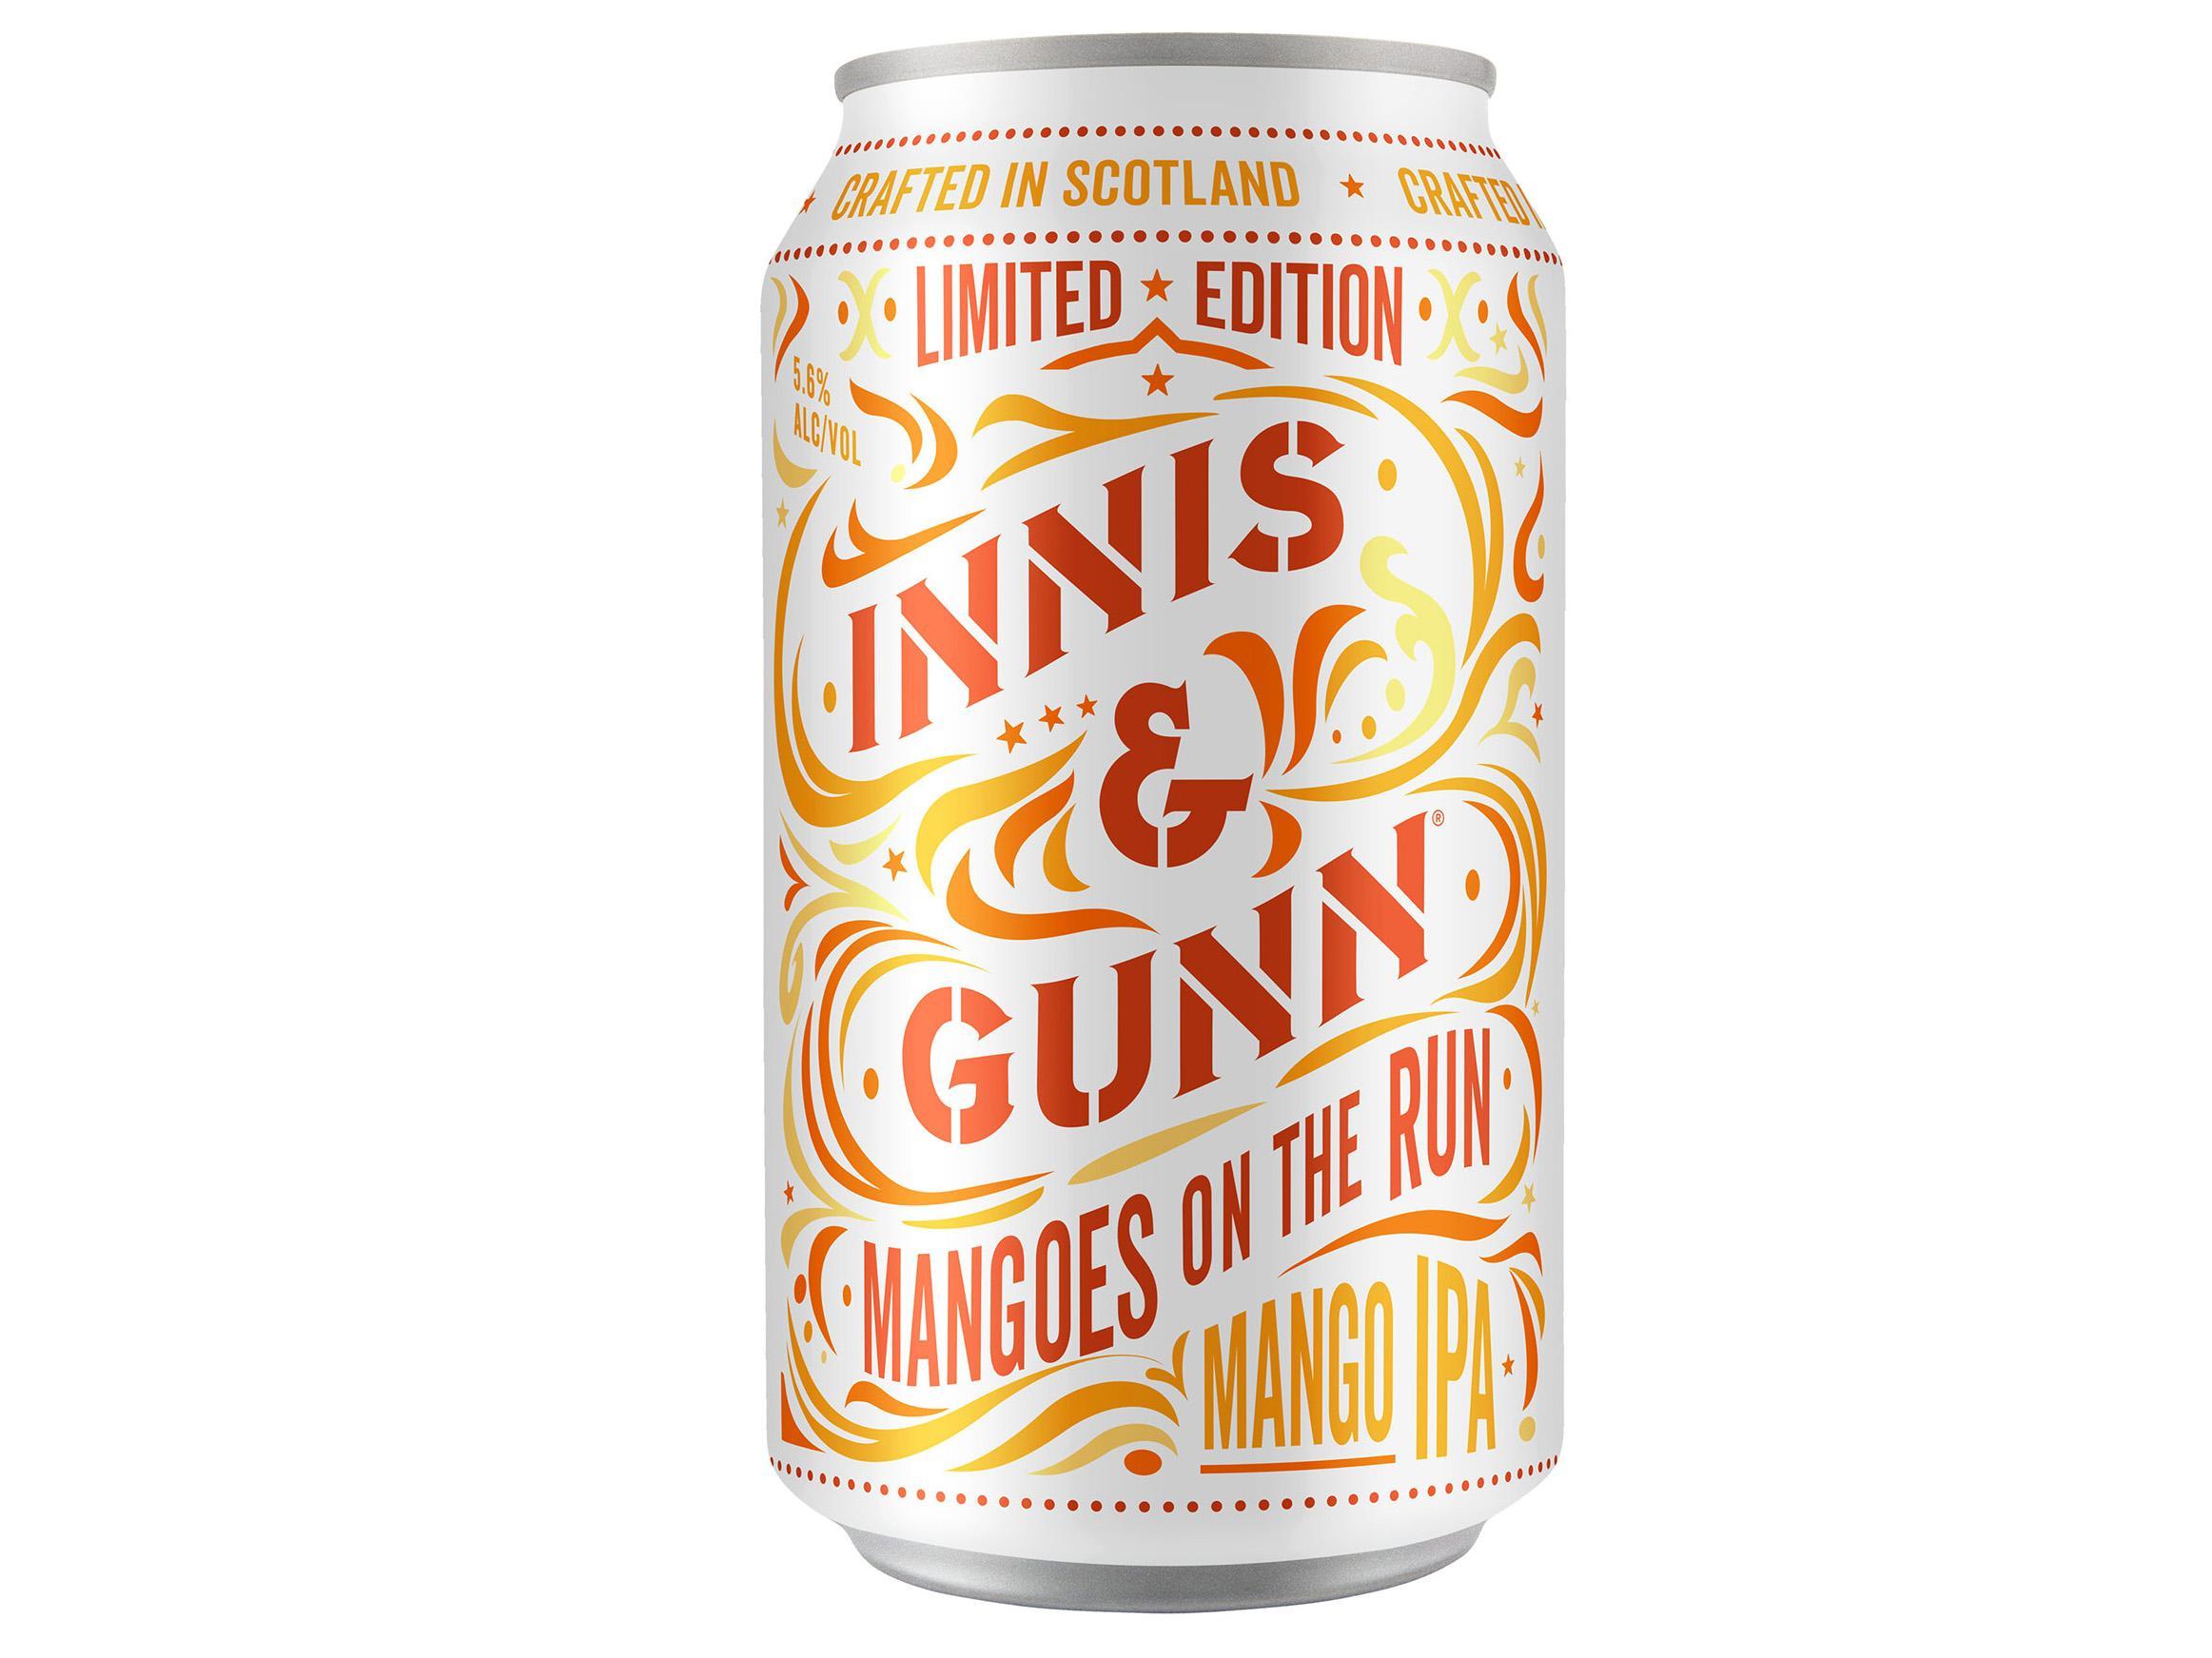 10 best fruit beers | The Independent